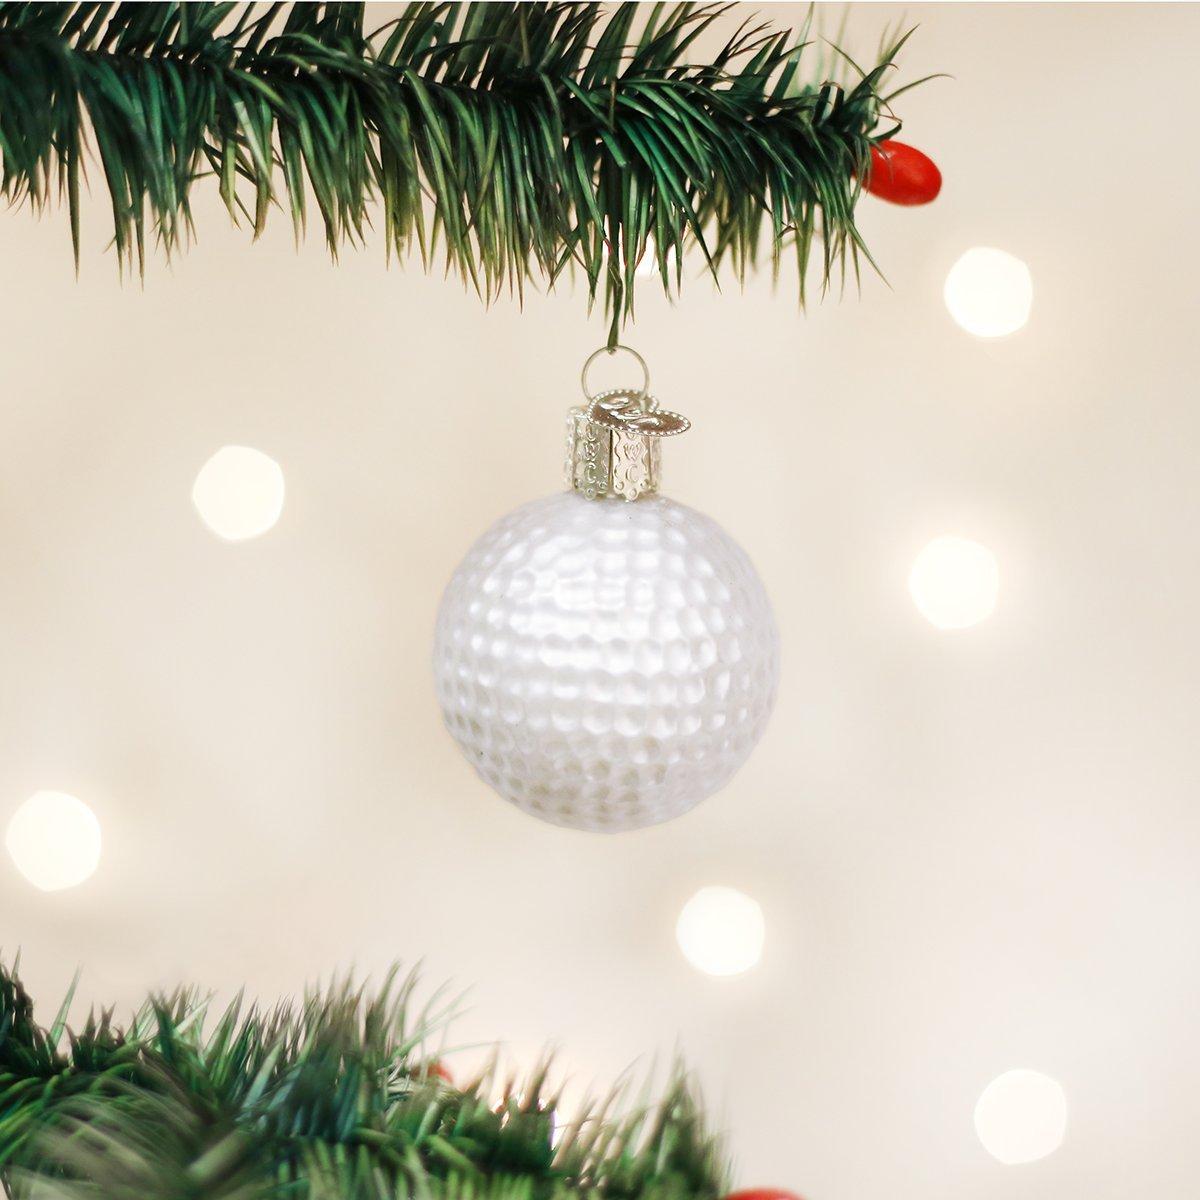 Camera christmas ornaments - Amazon Com Old World Christmas Golf Ball Glass Blown Ornament Home Kitchen